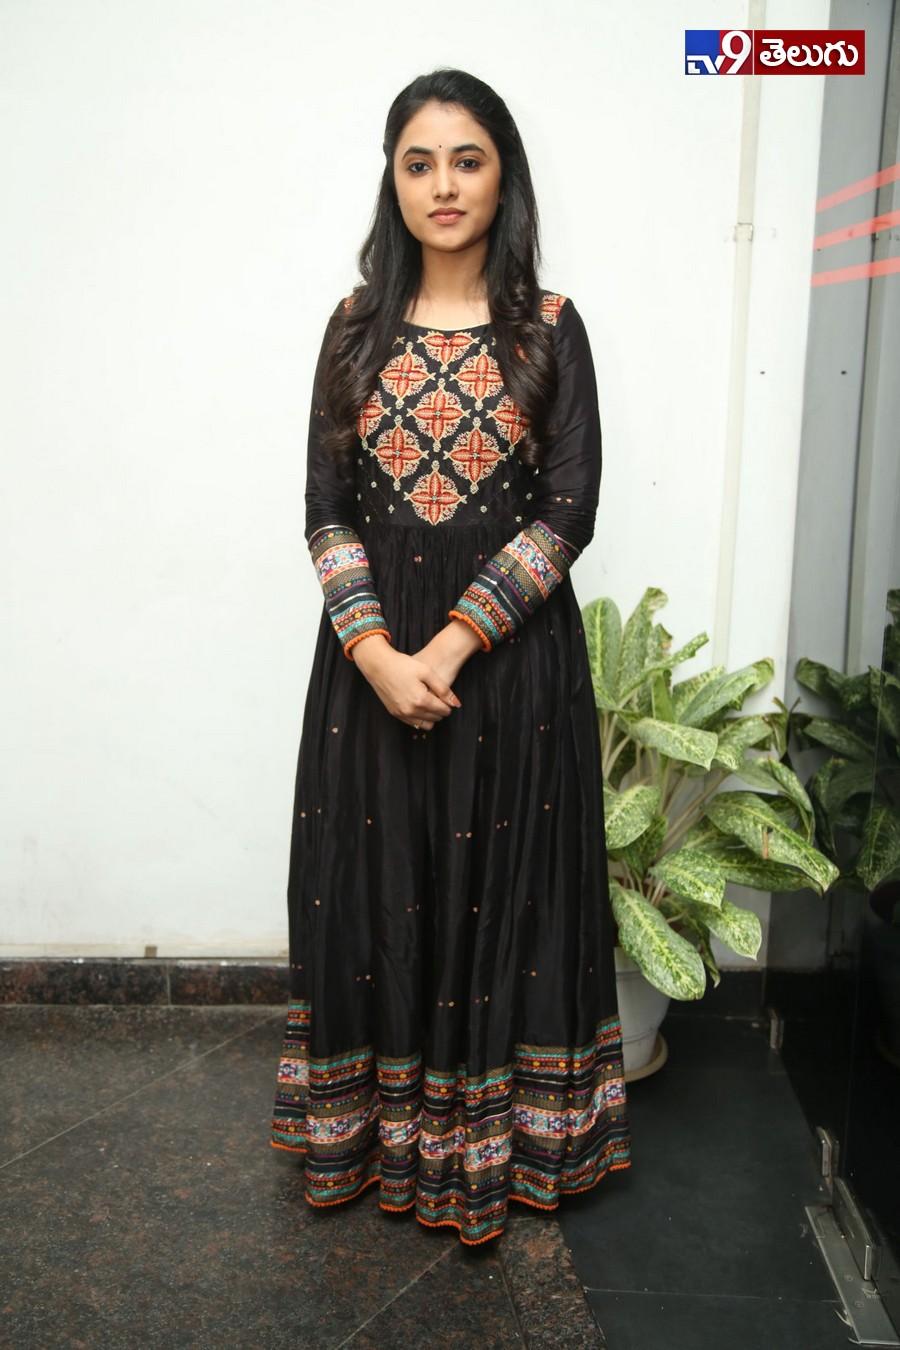 Priyanka Arul Mohan New Photos, ' ప్రియాంక అరుల్ మోహన్' ఫొటోస్